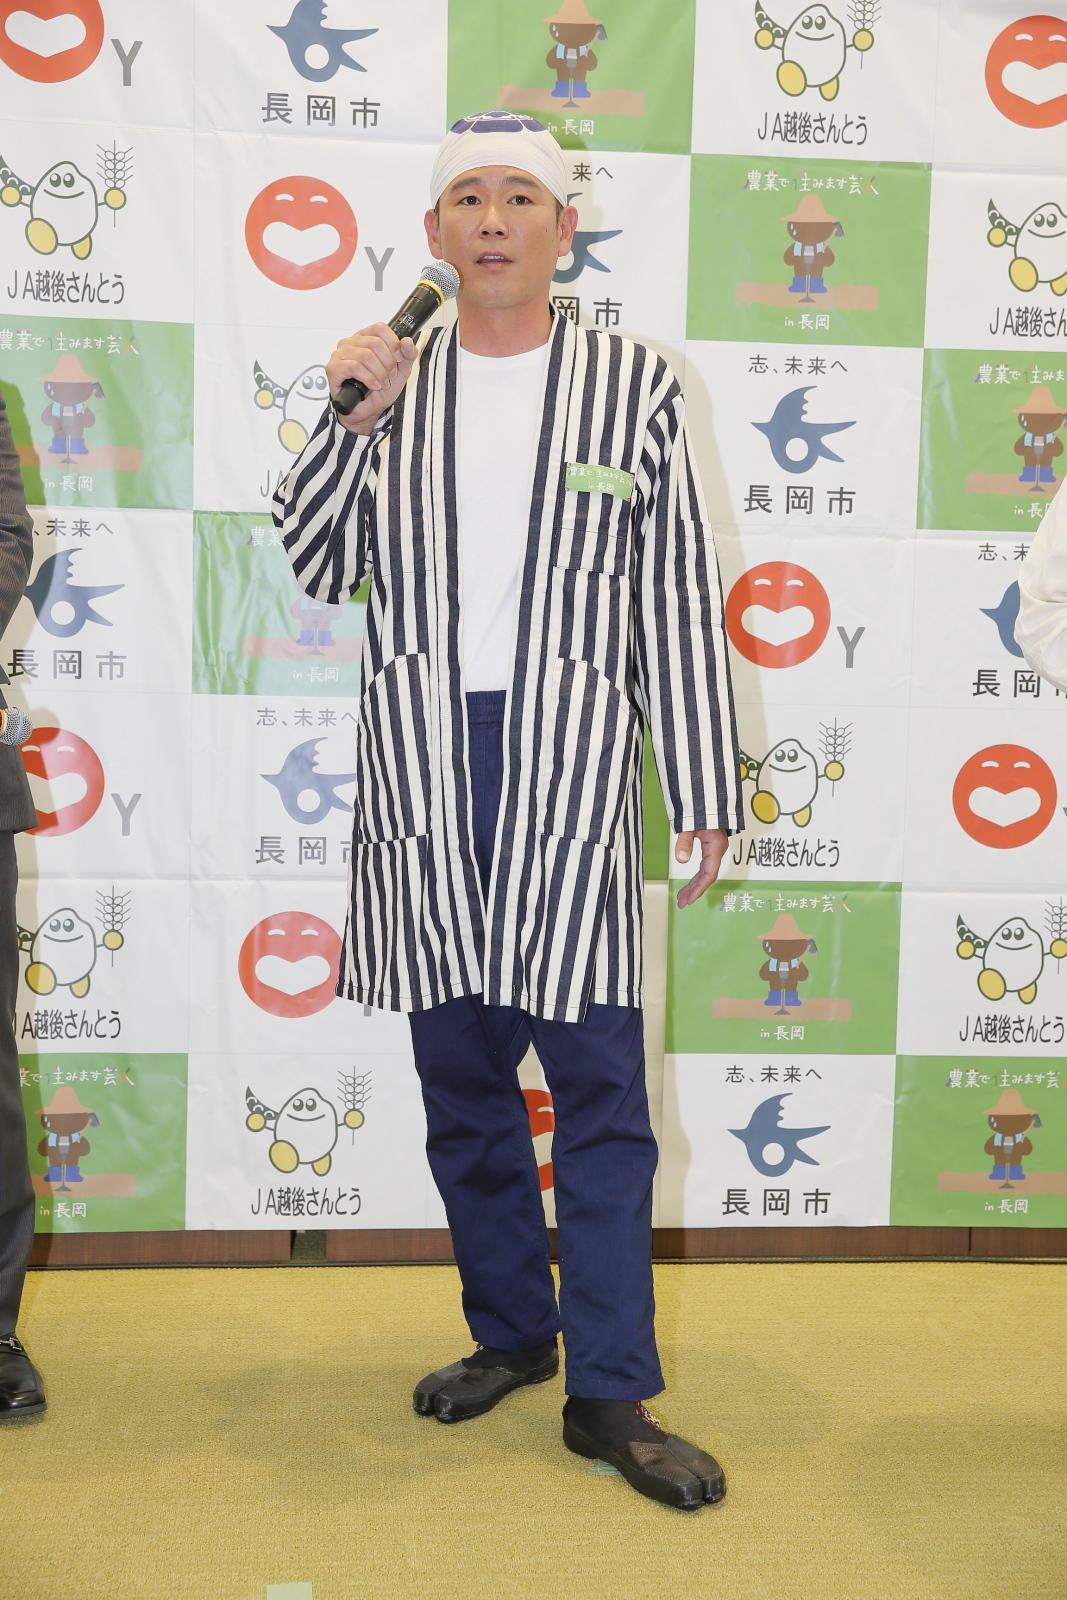 http://news.yoshimoto.co.jp/20160429190442-650673bcb37db6e4f70823d75d8c728e34d91e9c.jpg